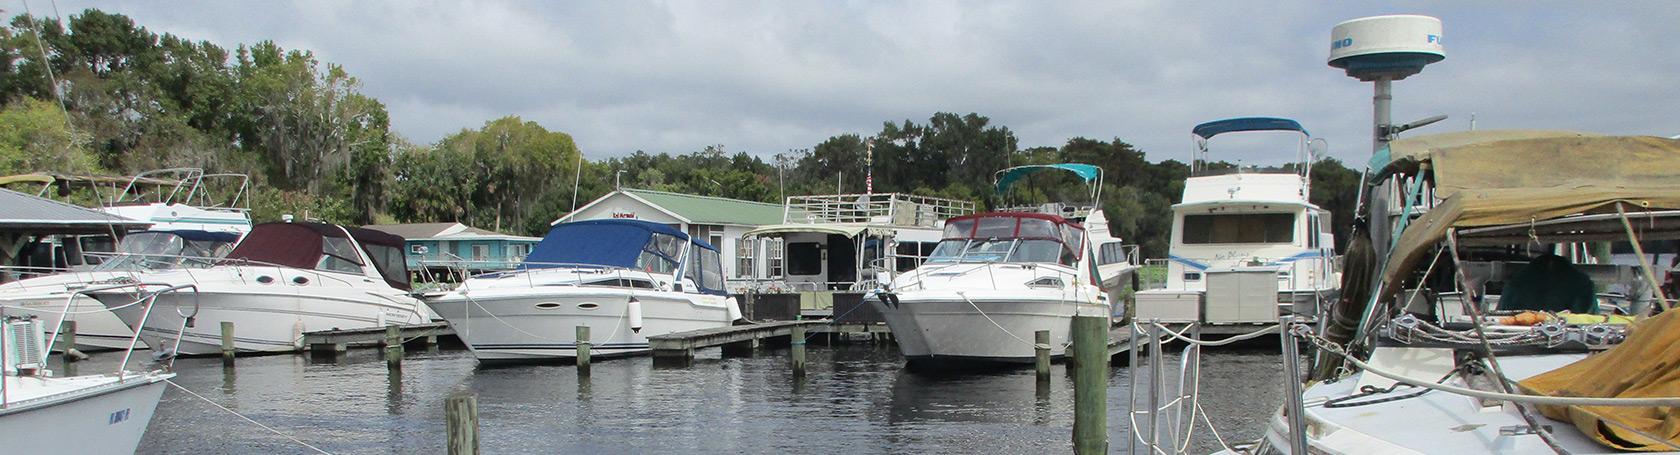 Astor Landing Rv Park Campground Marina Astor Florida